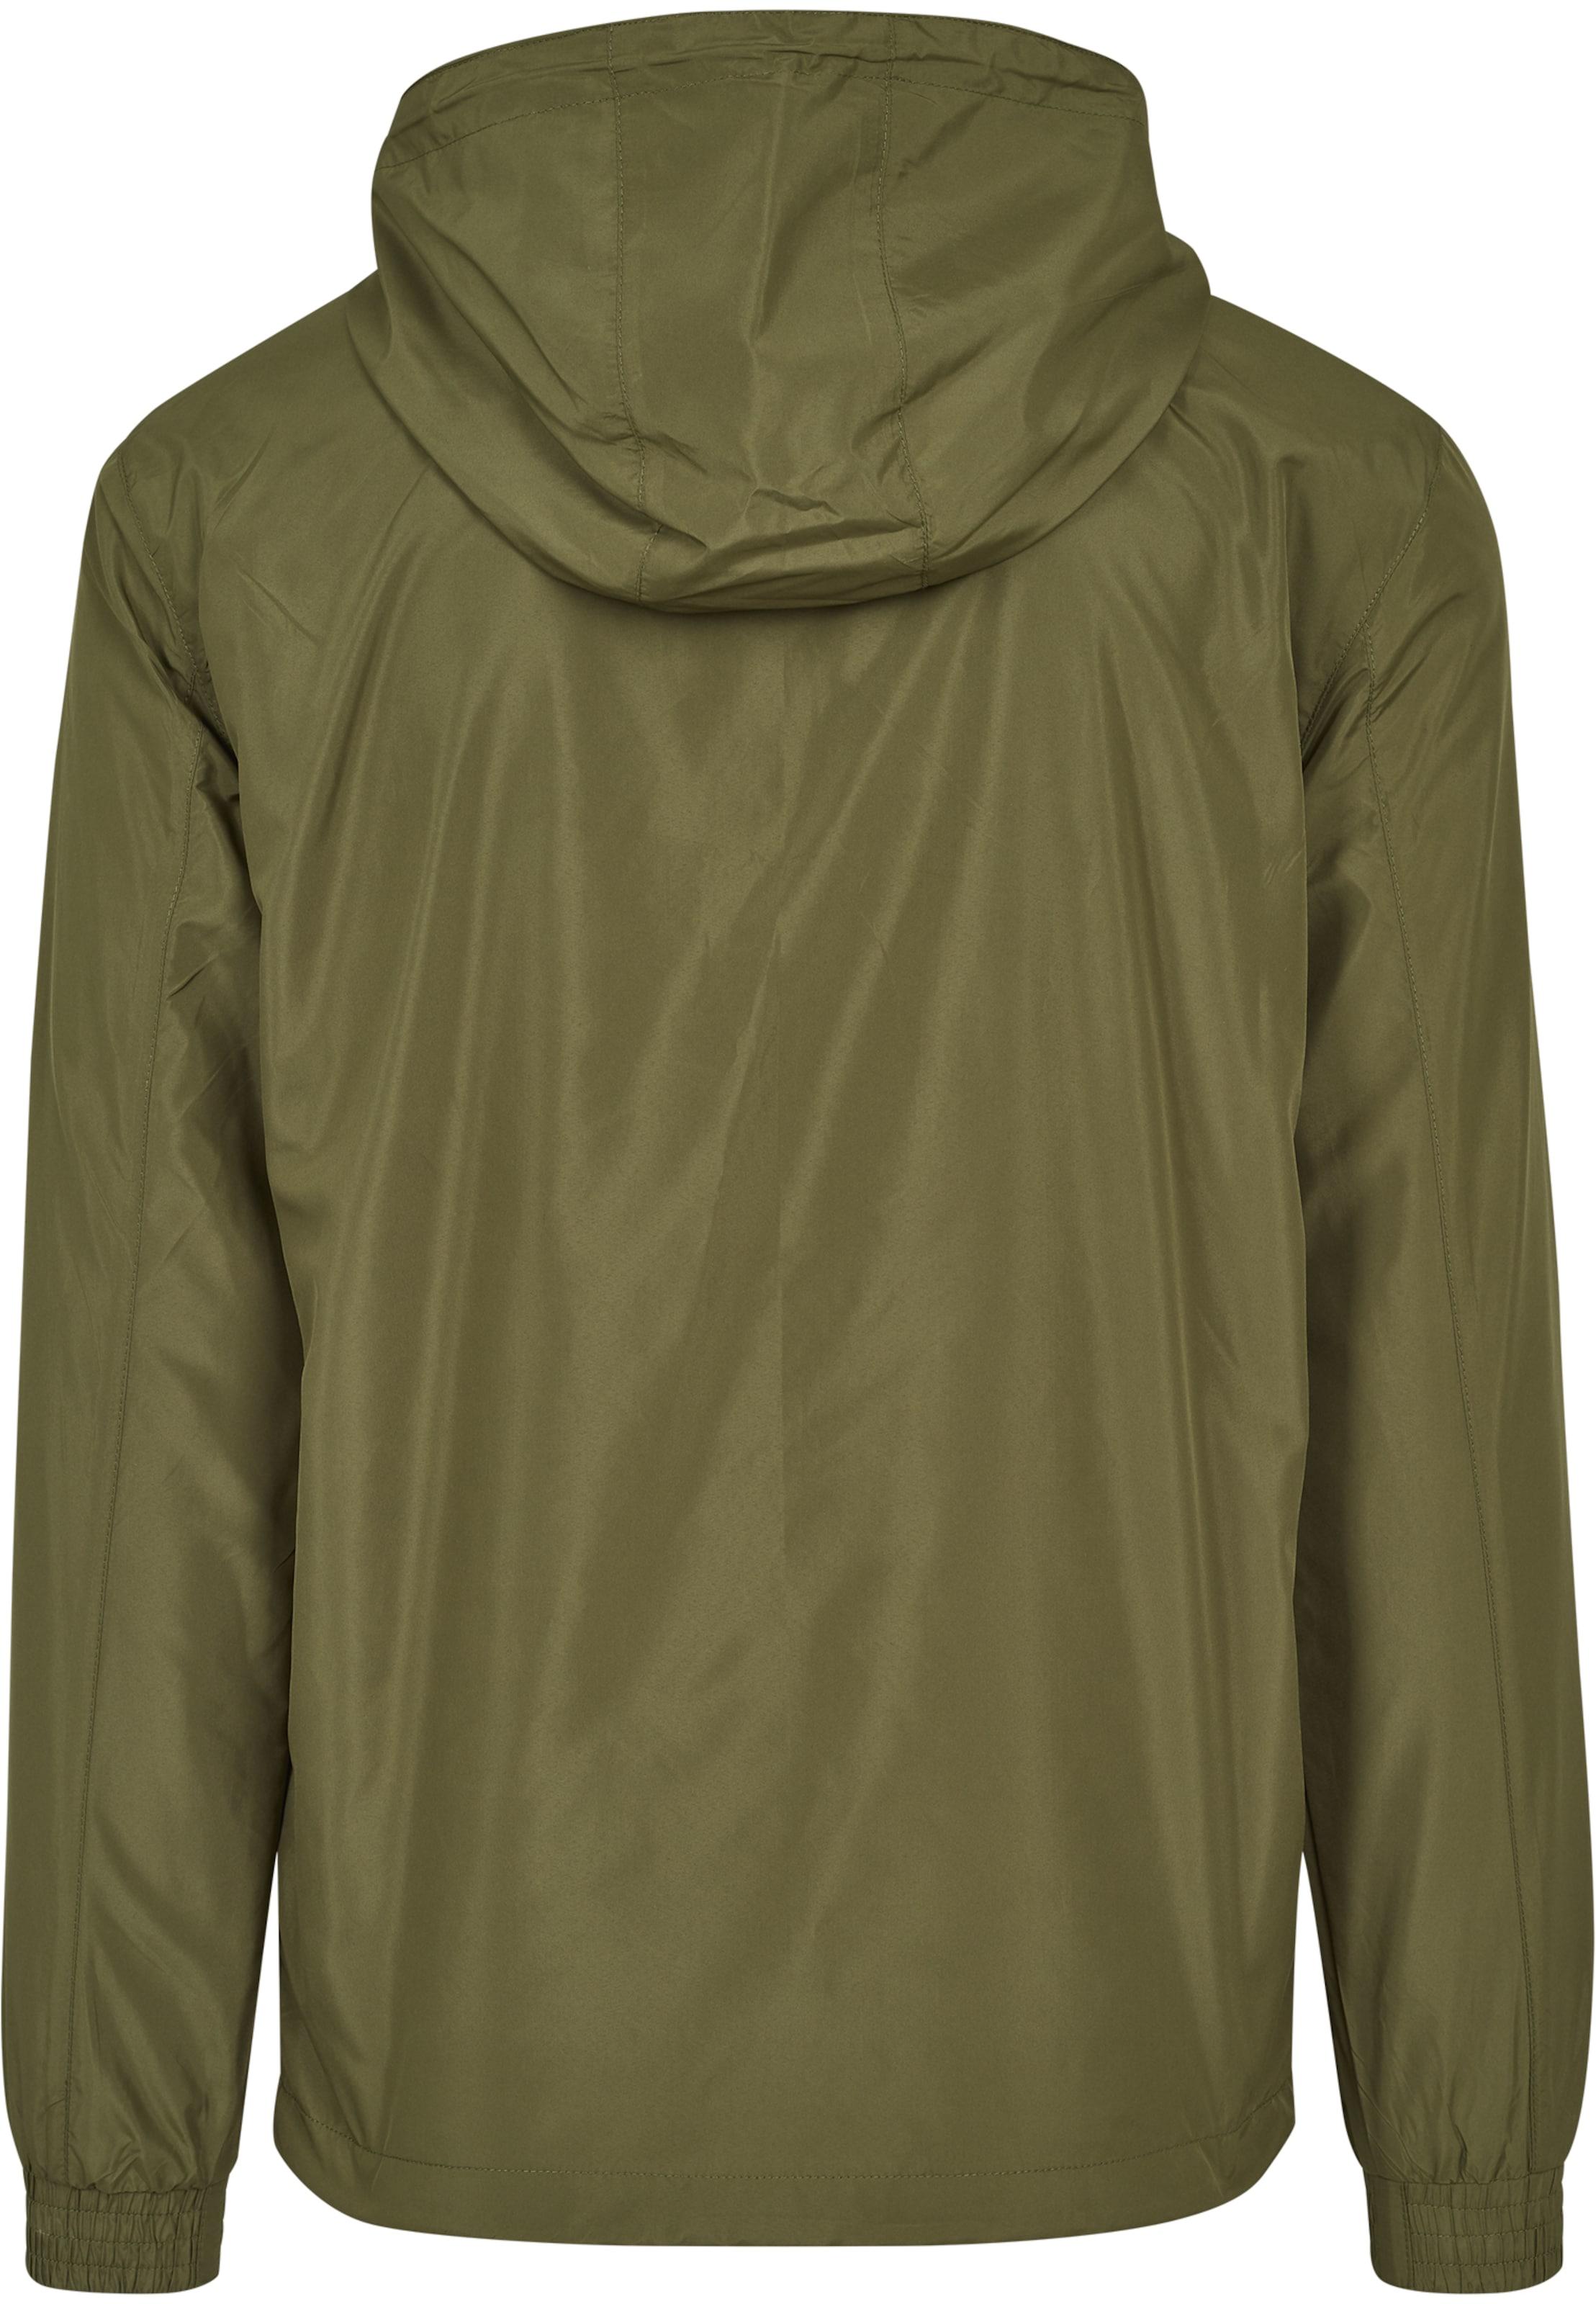 Urban 'basic Oliv Pullover In Classics Übergangsjacke Jacket' wNm8vn0